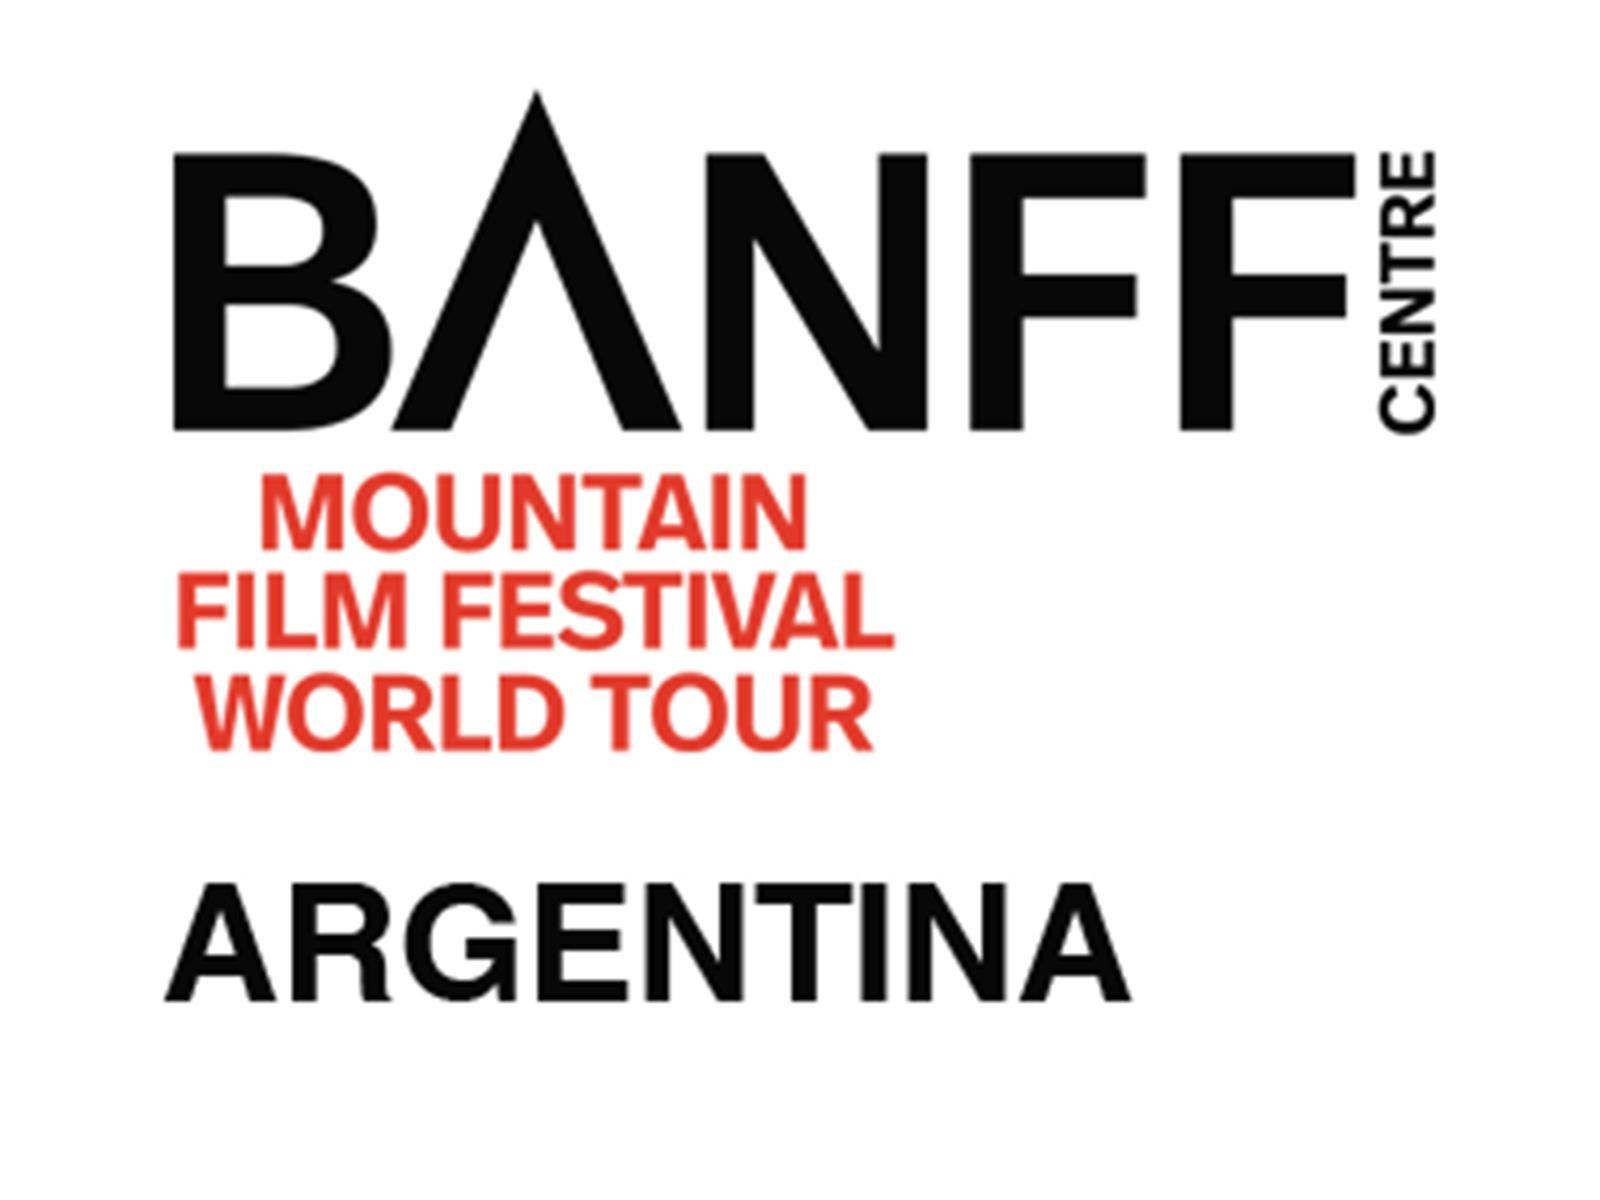 Jeep presenta el Banff Mountain Film Festival en Argentina